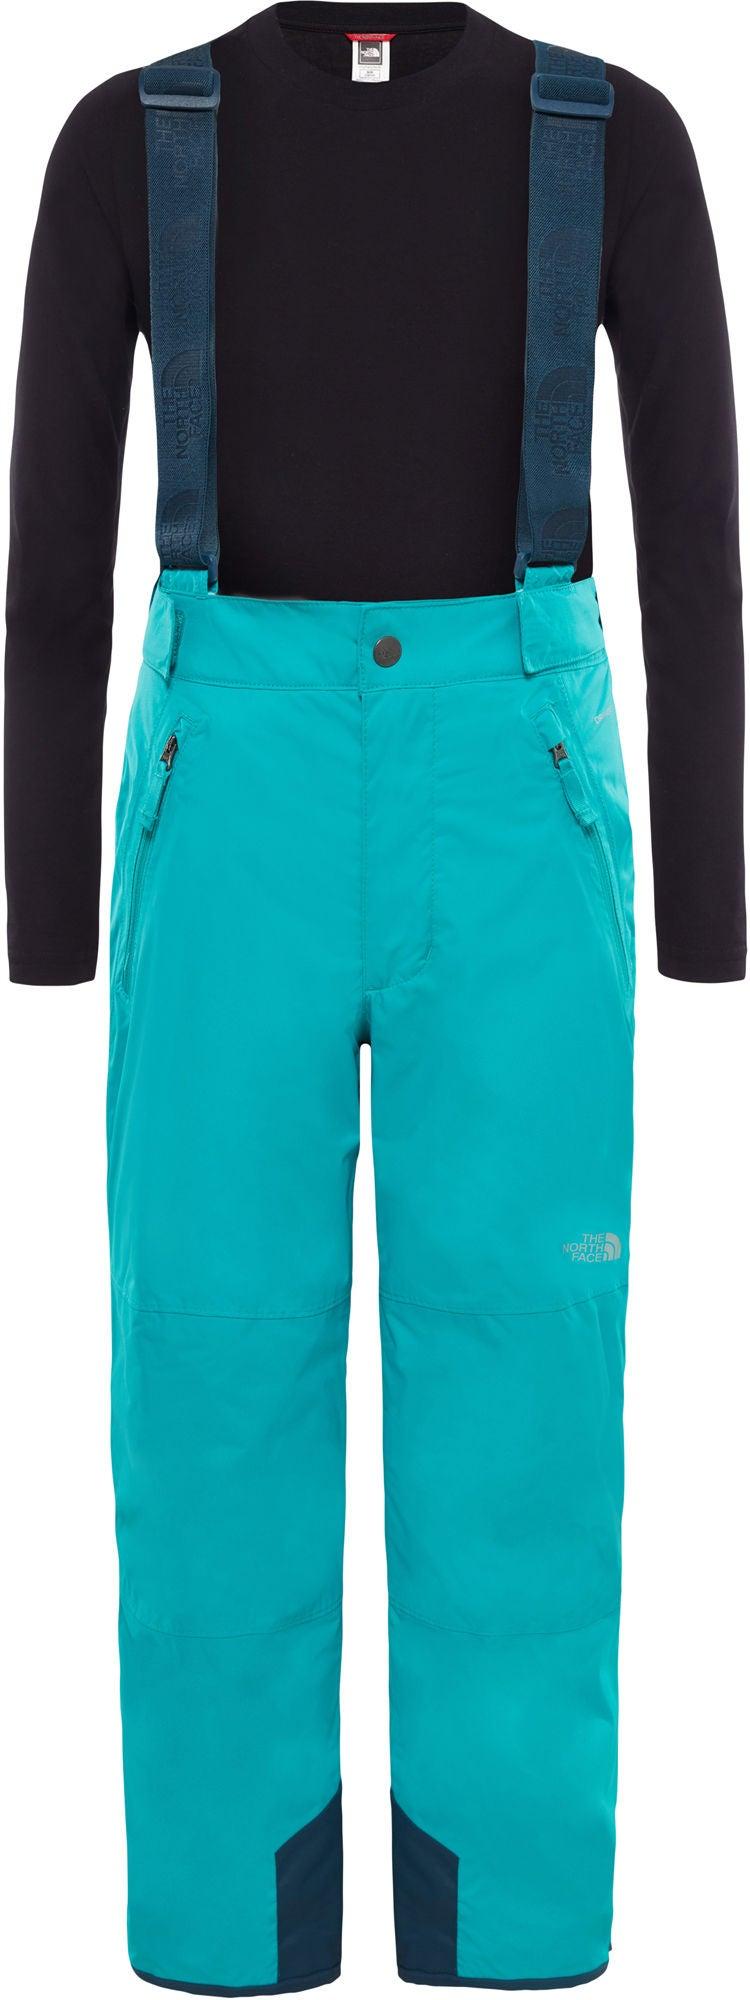 The North Face Snowquest Suspender Plus Byxa Barn, Kokomo Green XL